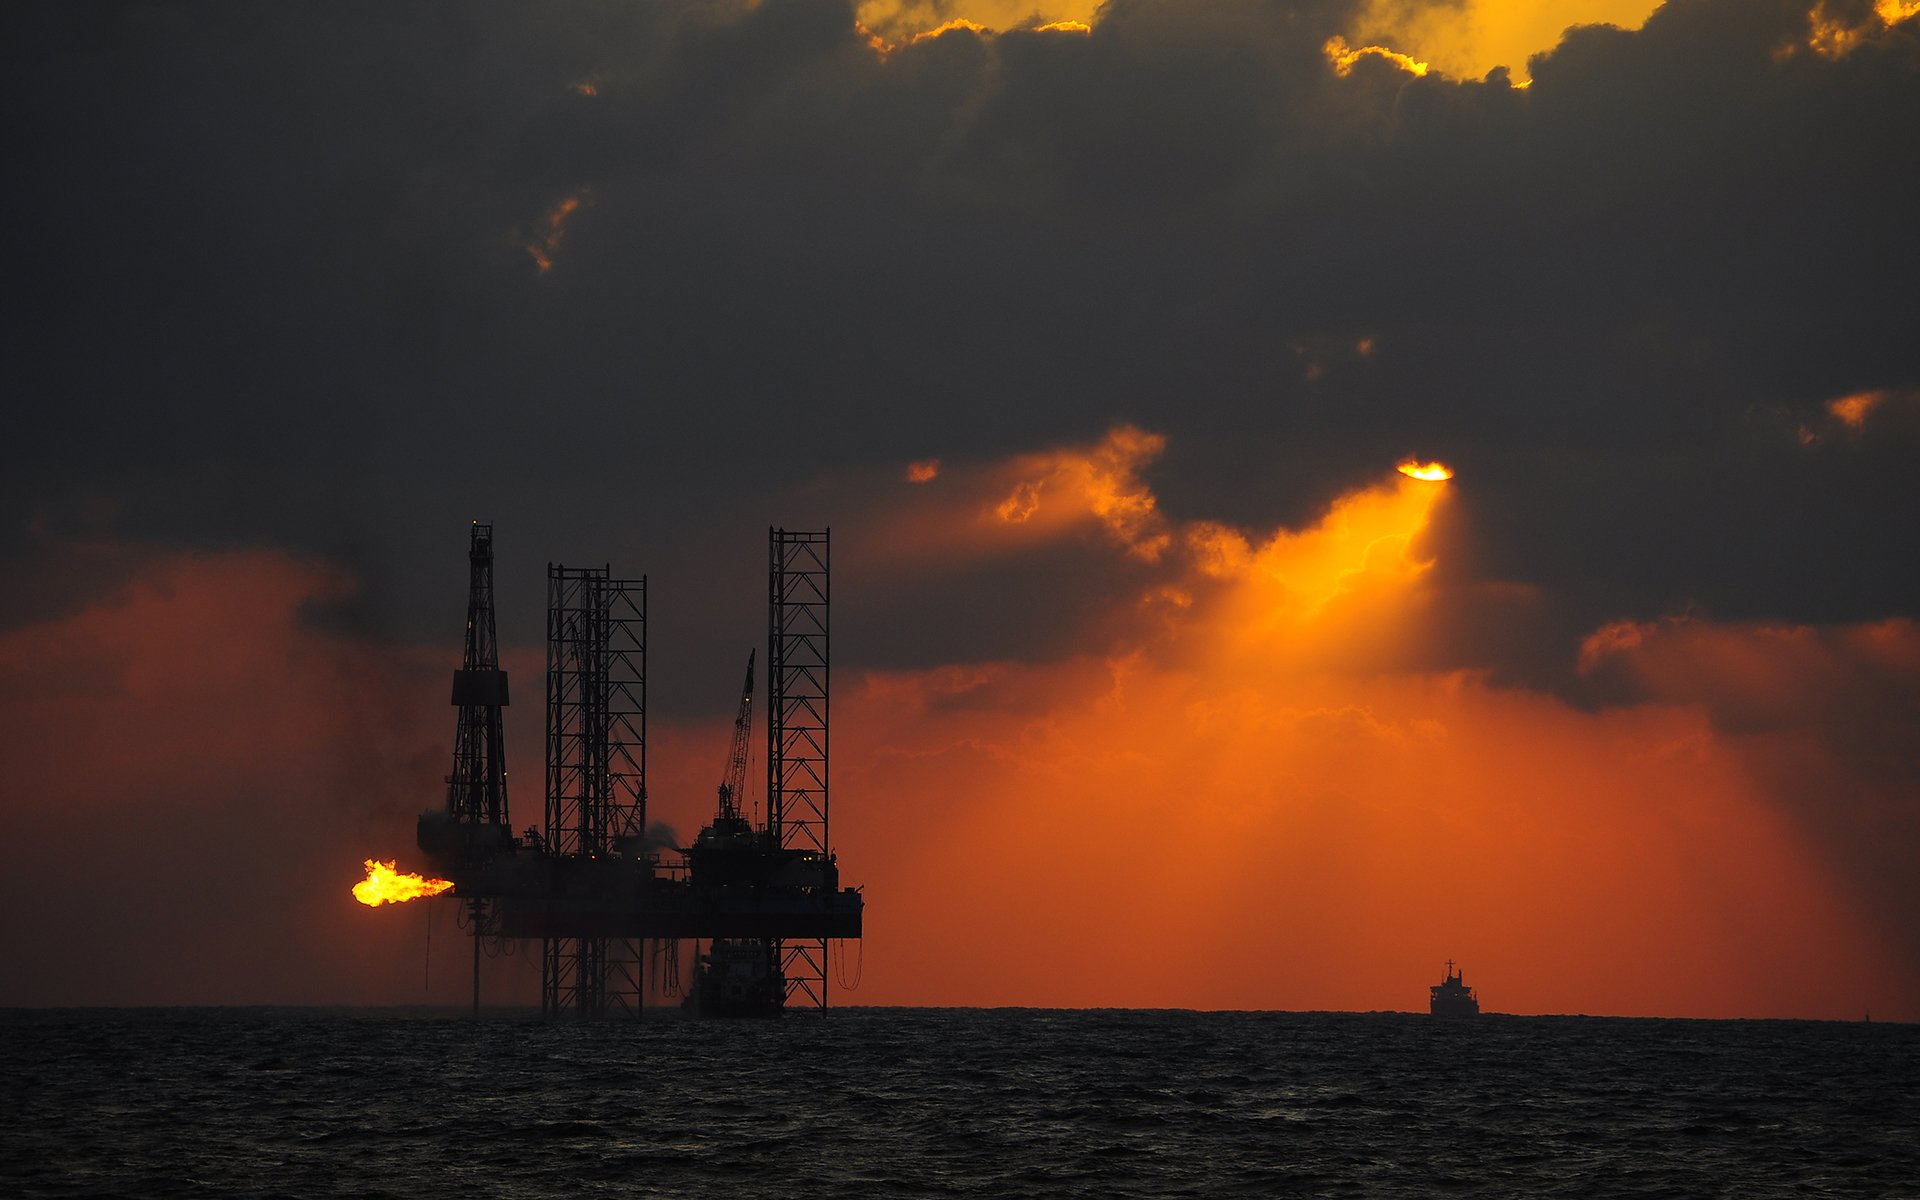 Oil Platform Hd Wallpaper Background Image 1920x1200